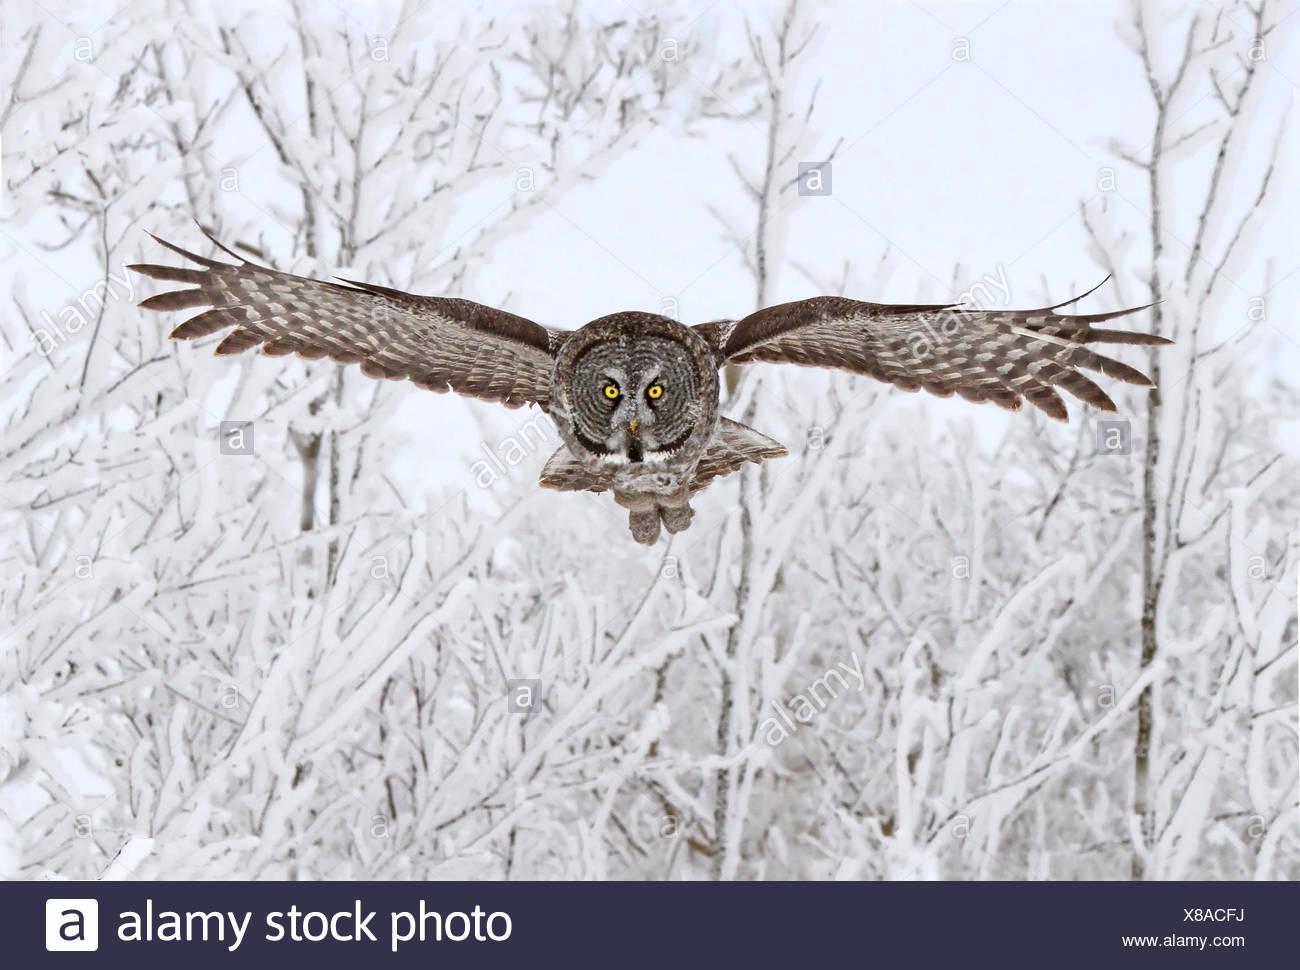 Great Gray Owl, Strix nebulosa, in flight at the Nisbet Forest, Saskatchewan, Canada - Stock Image